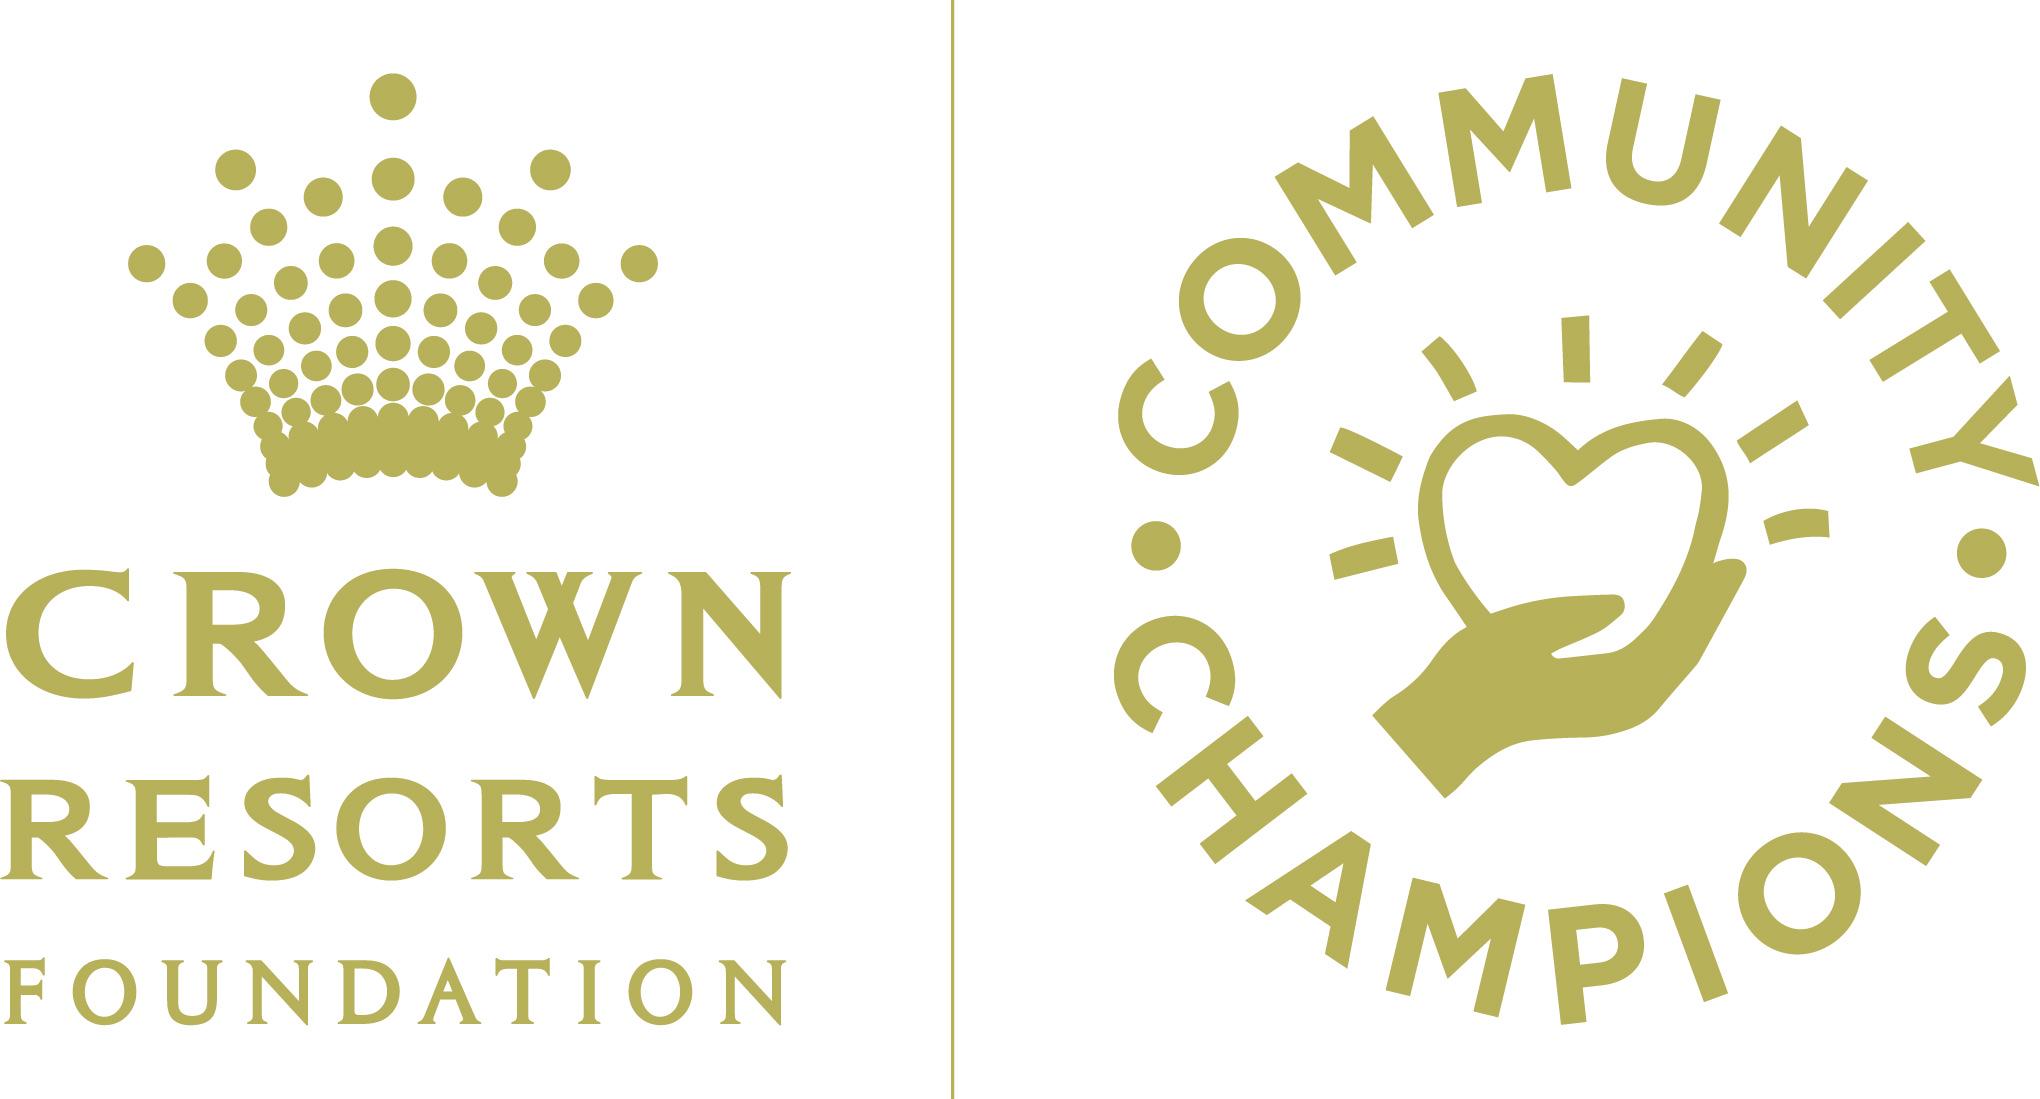 crown-resorts-foundation-community-champions_logo_gold_cmyk